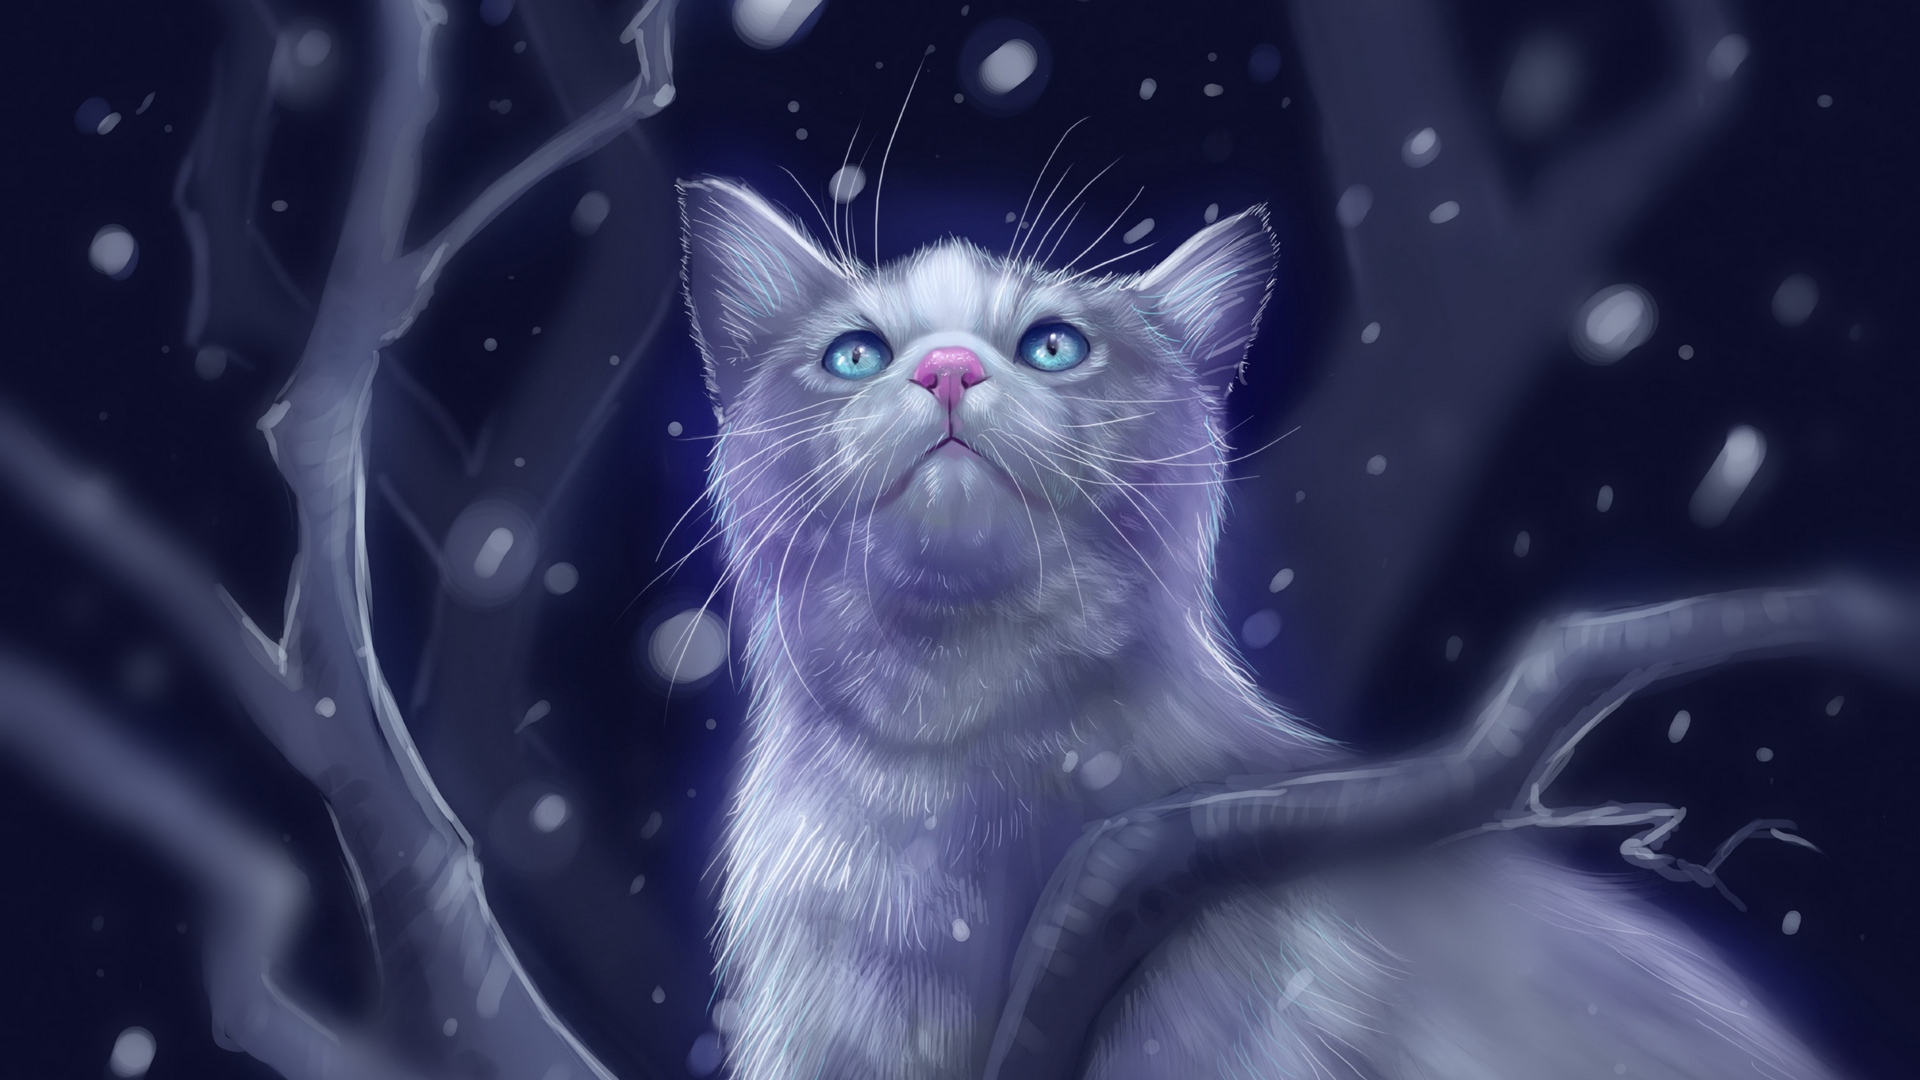 Cat Night 1920x1080